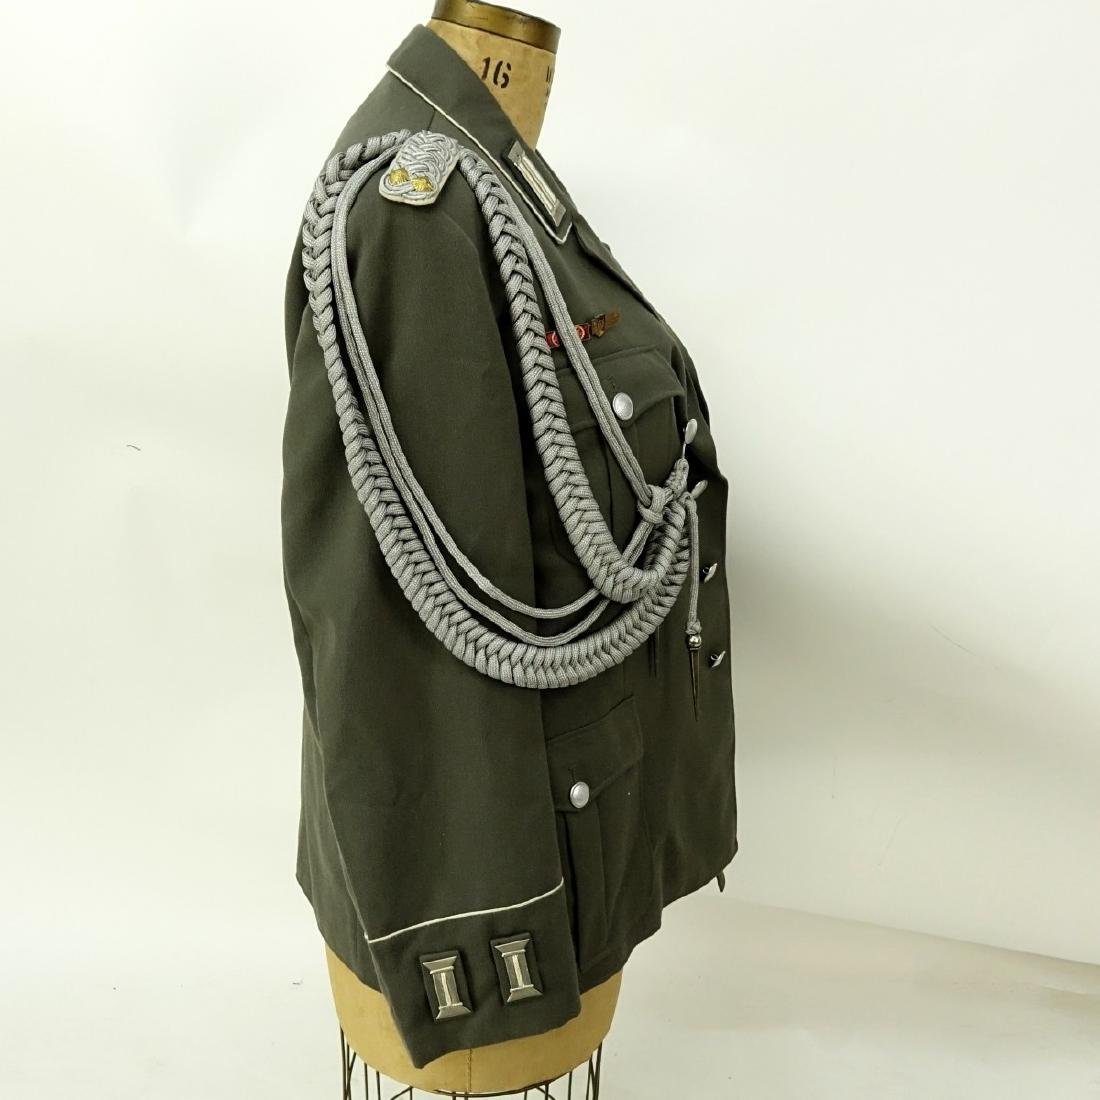 Russian Soviet Era Military Uniform Set With Metal - 6